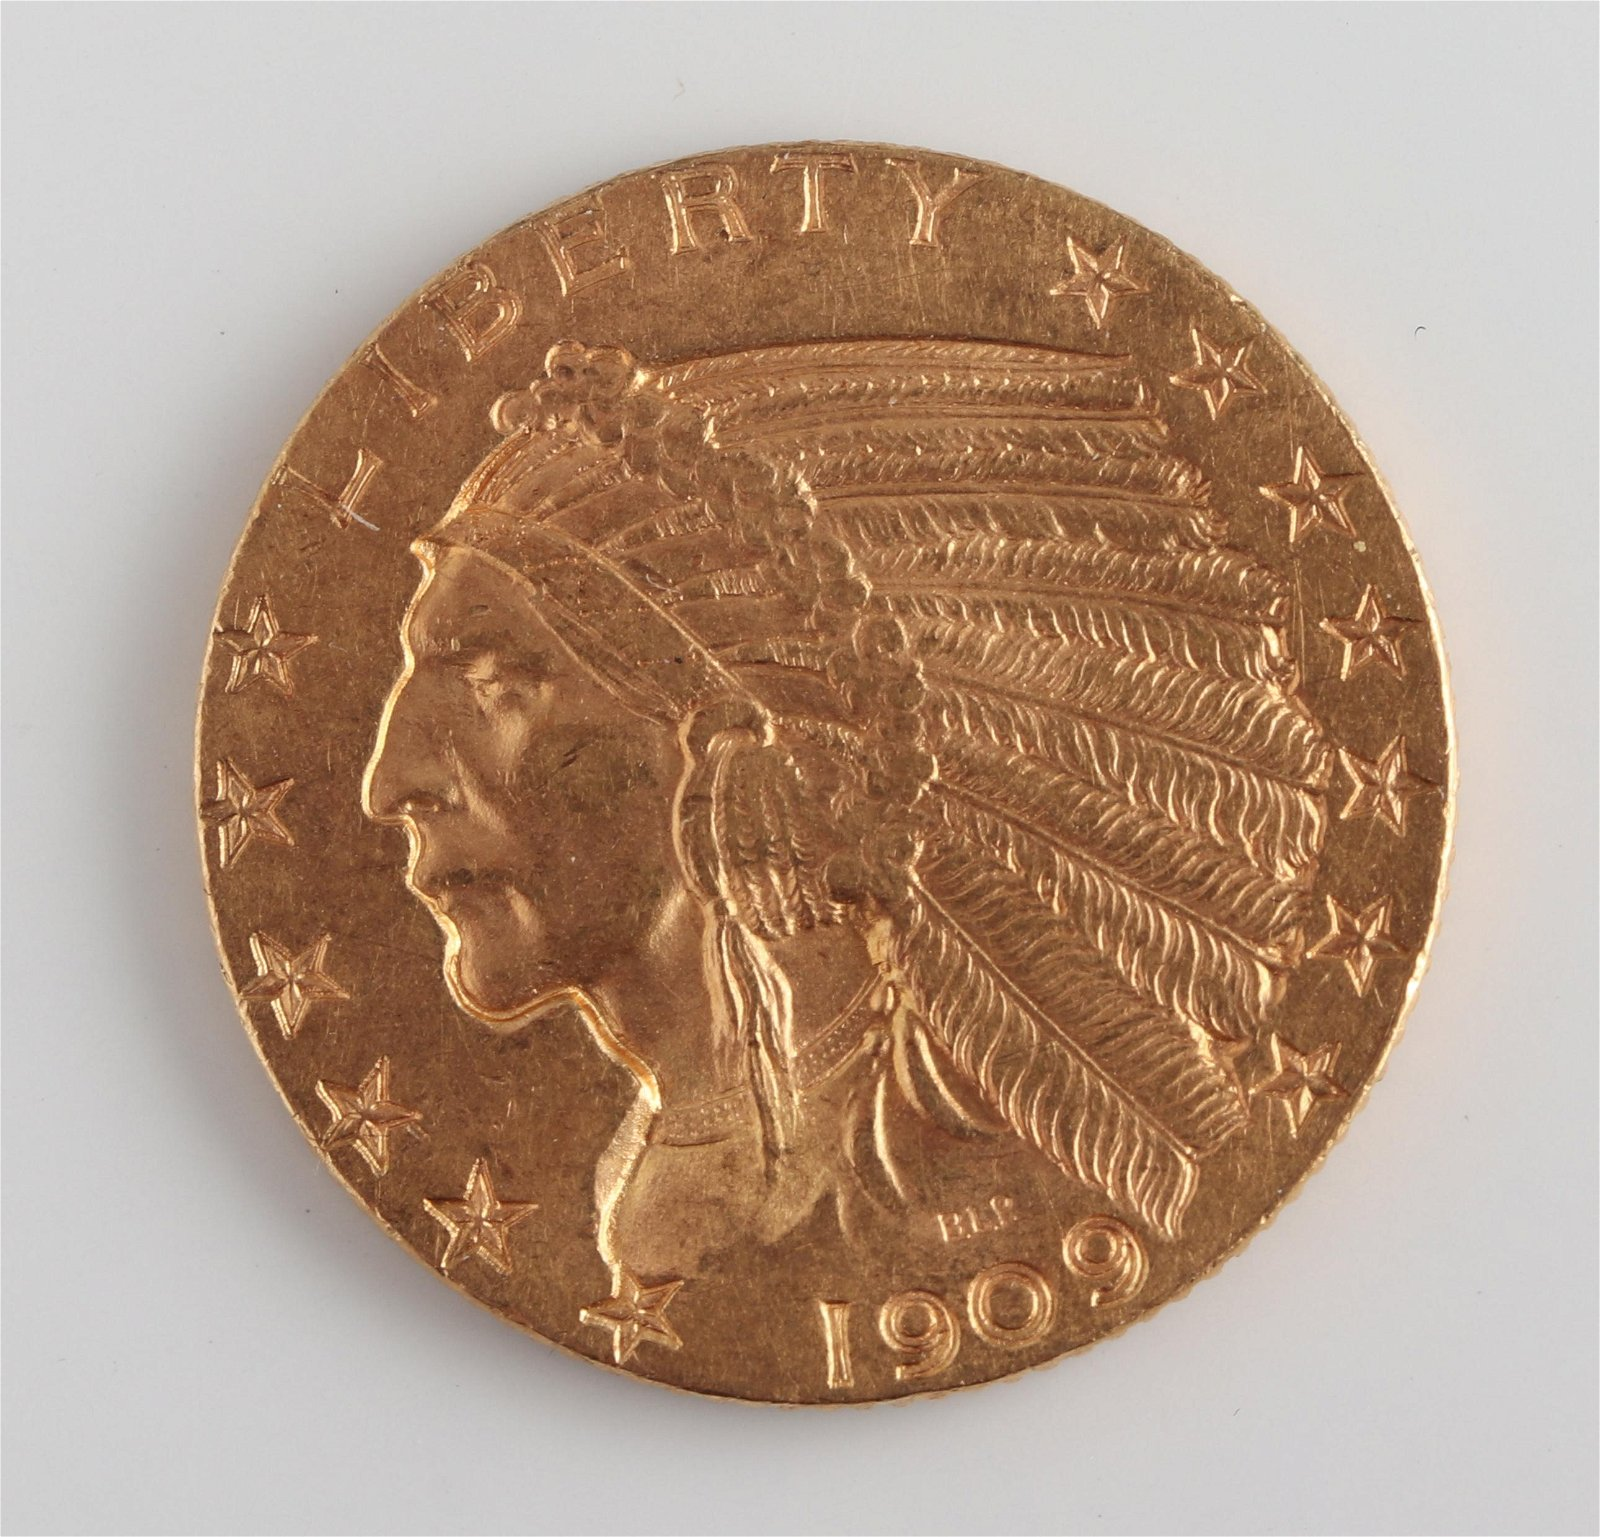 1909 Indian Head $5 Half Eagle Gold Coin